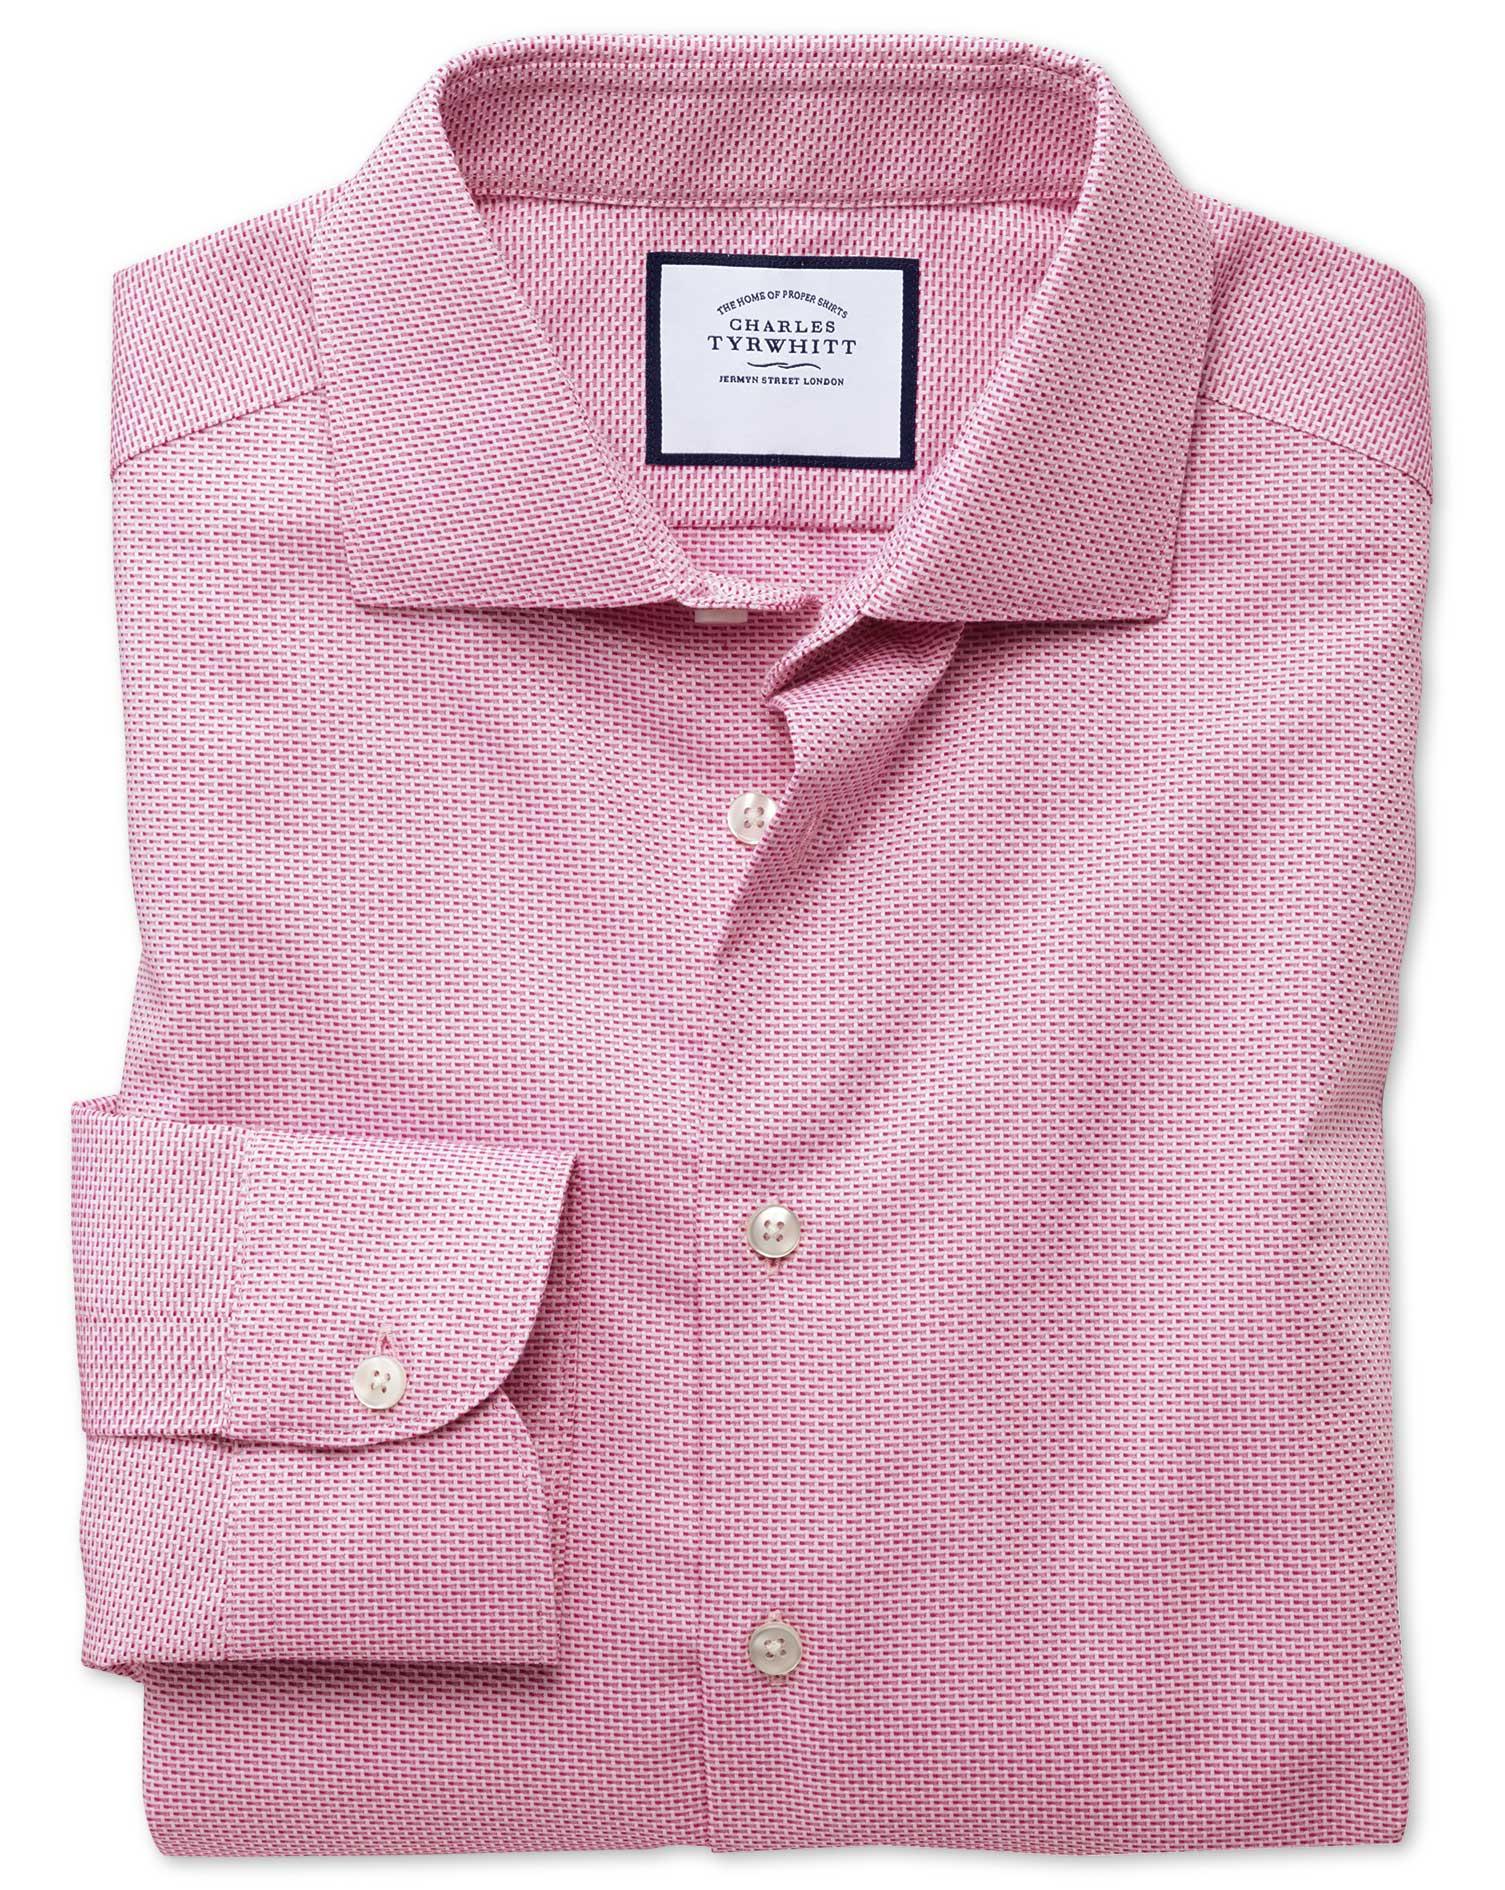 Slim Fit Semi-Cutaway Business Casual Non-Iron Modern Textures Pink Dash Cotton Formal Shirt Single